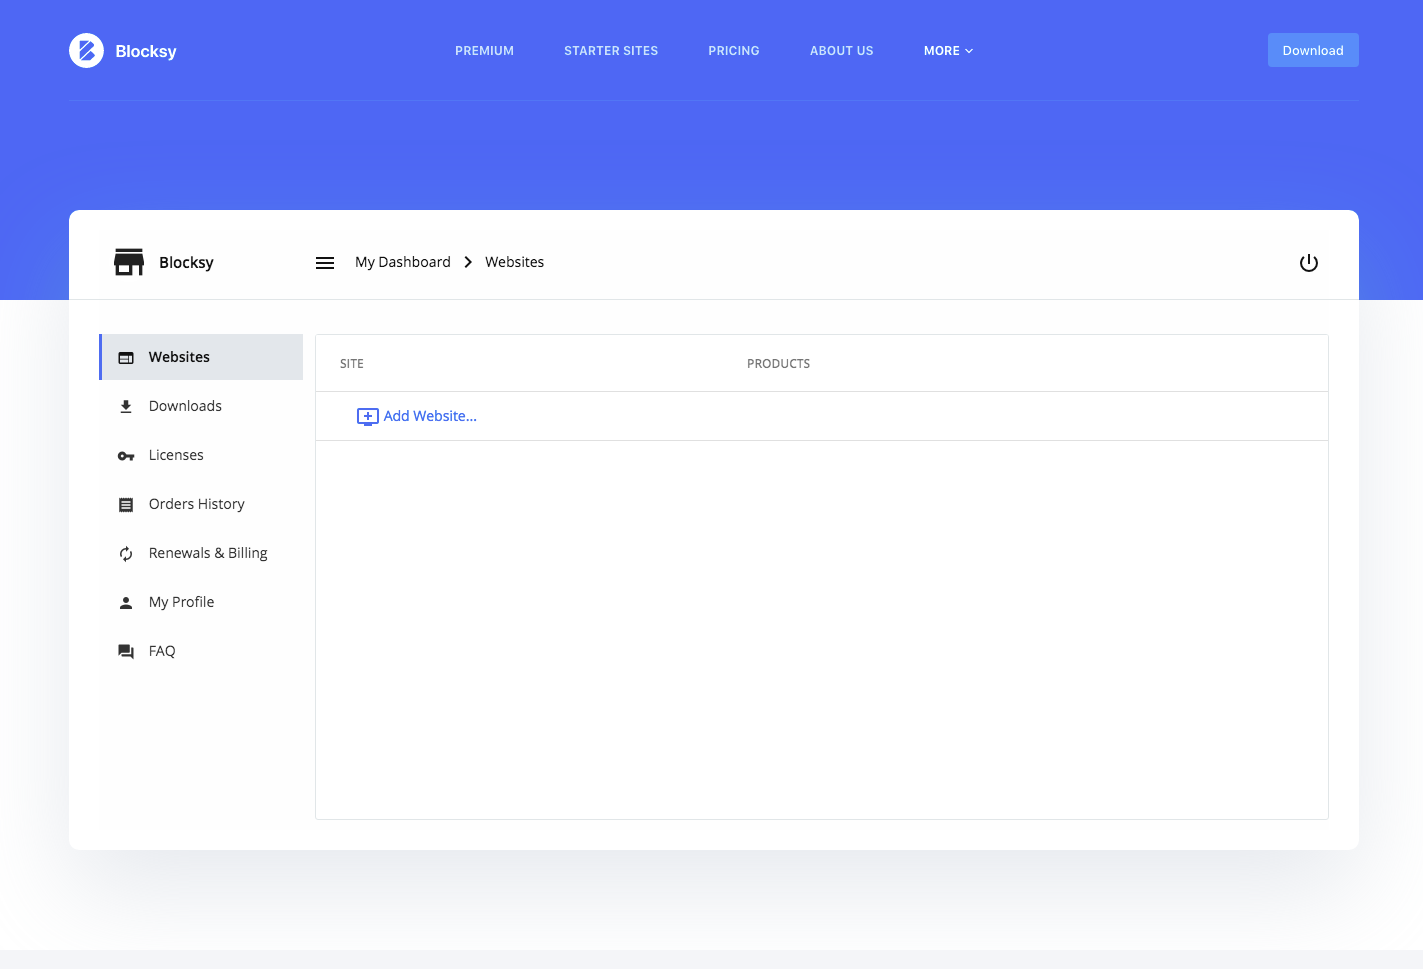 Blocksy Customized User Dashboard